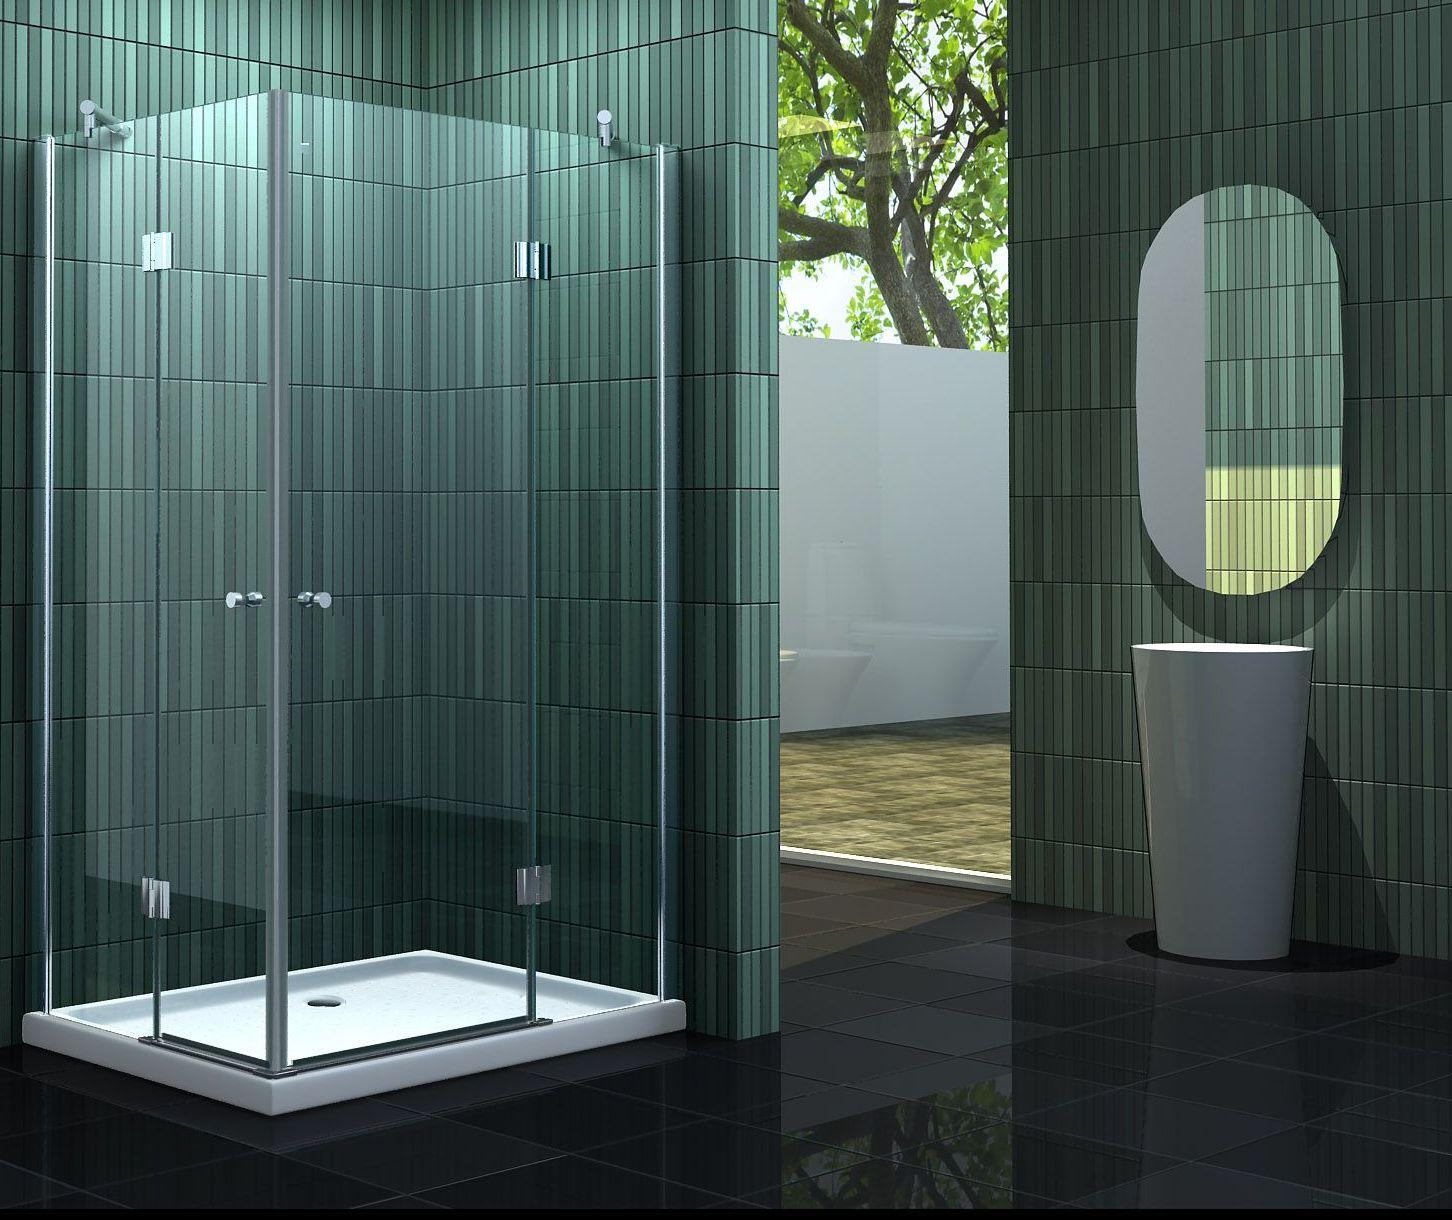 duschkabine banho 100 x 90 cm ohne duschtasse. Black Bedroom Furniture Sets. Home Design Ideas